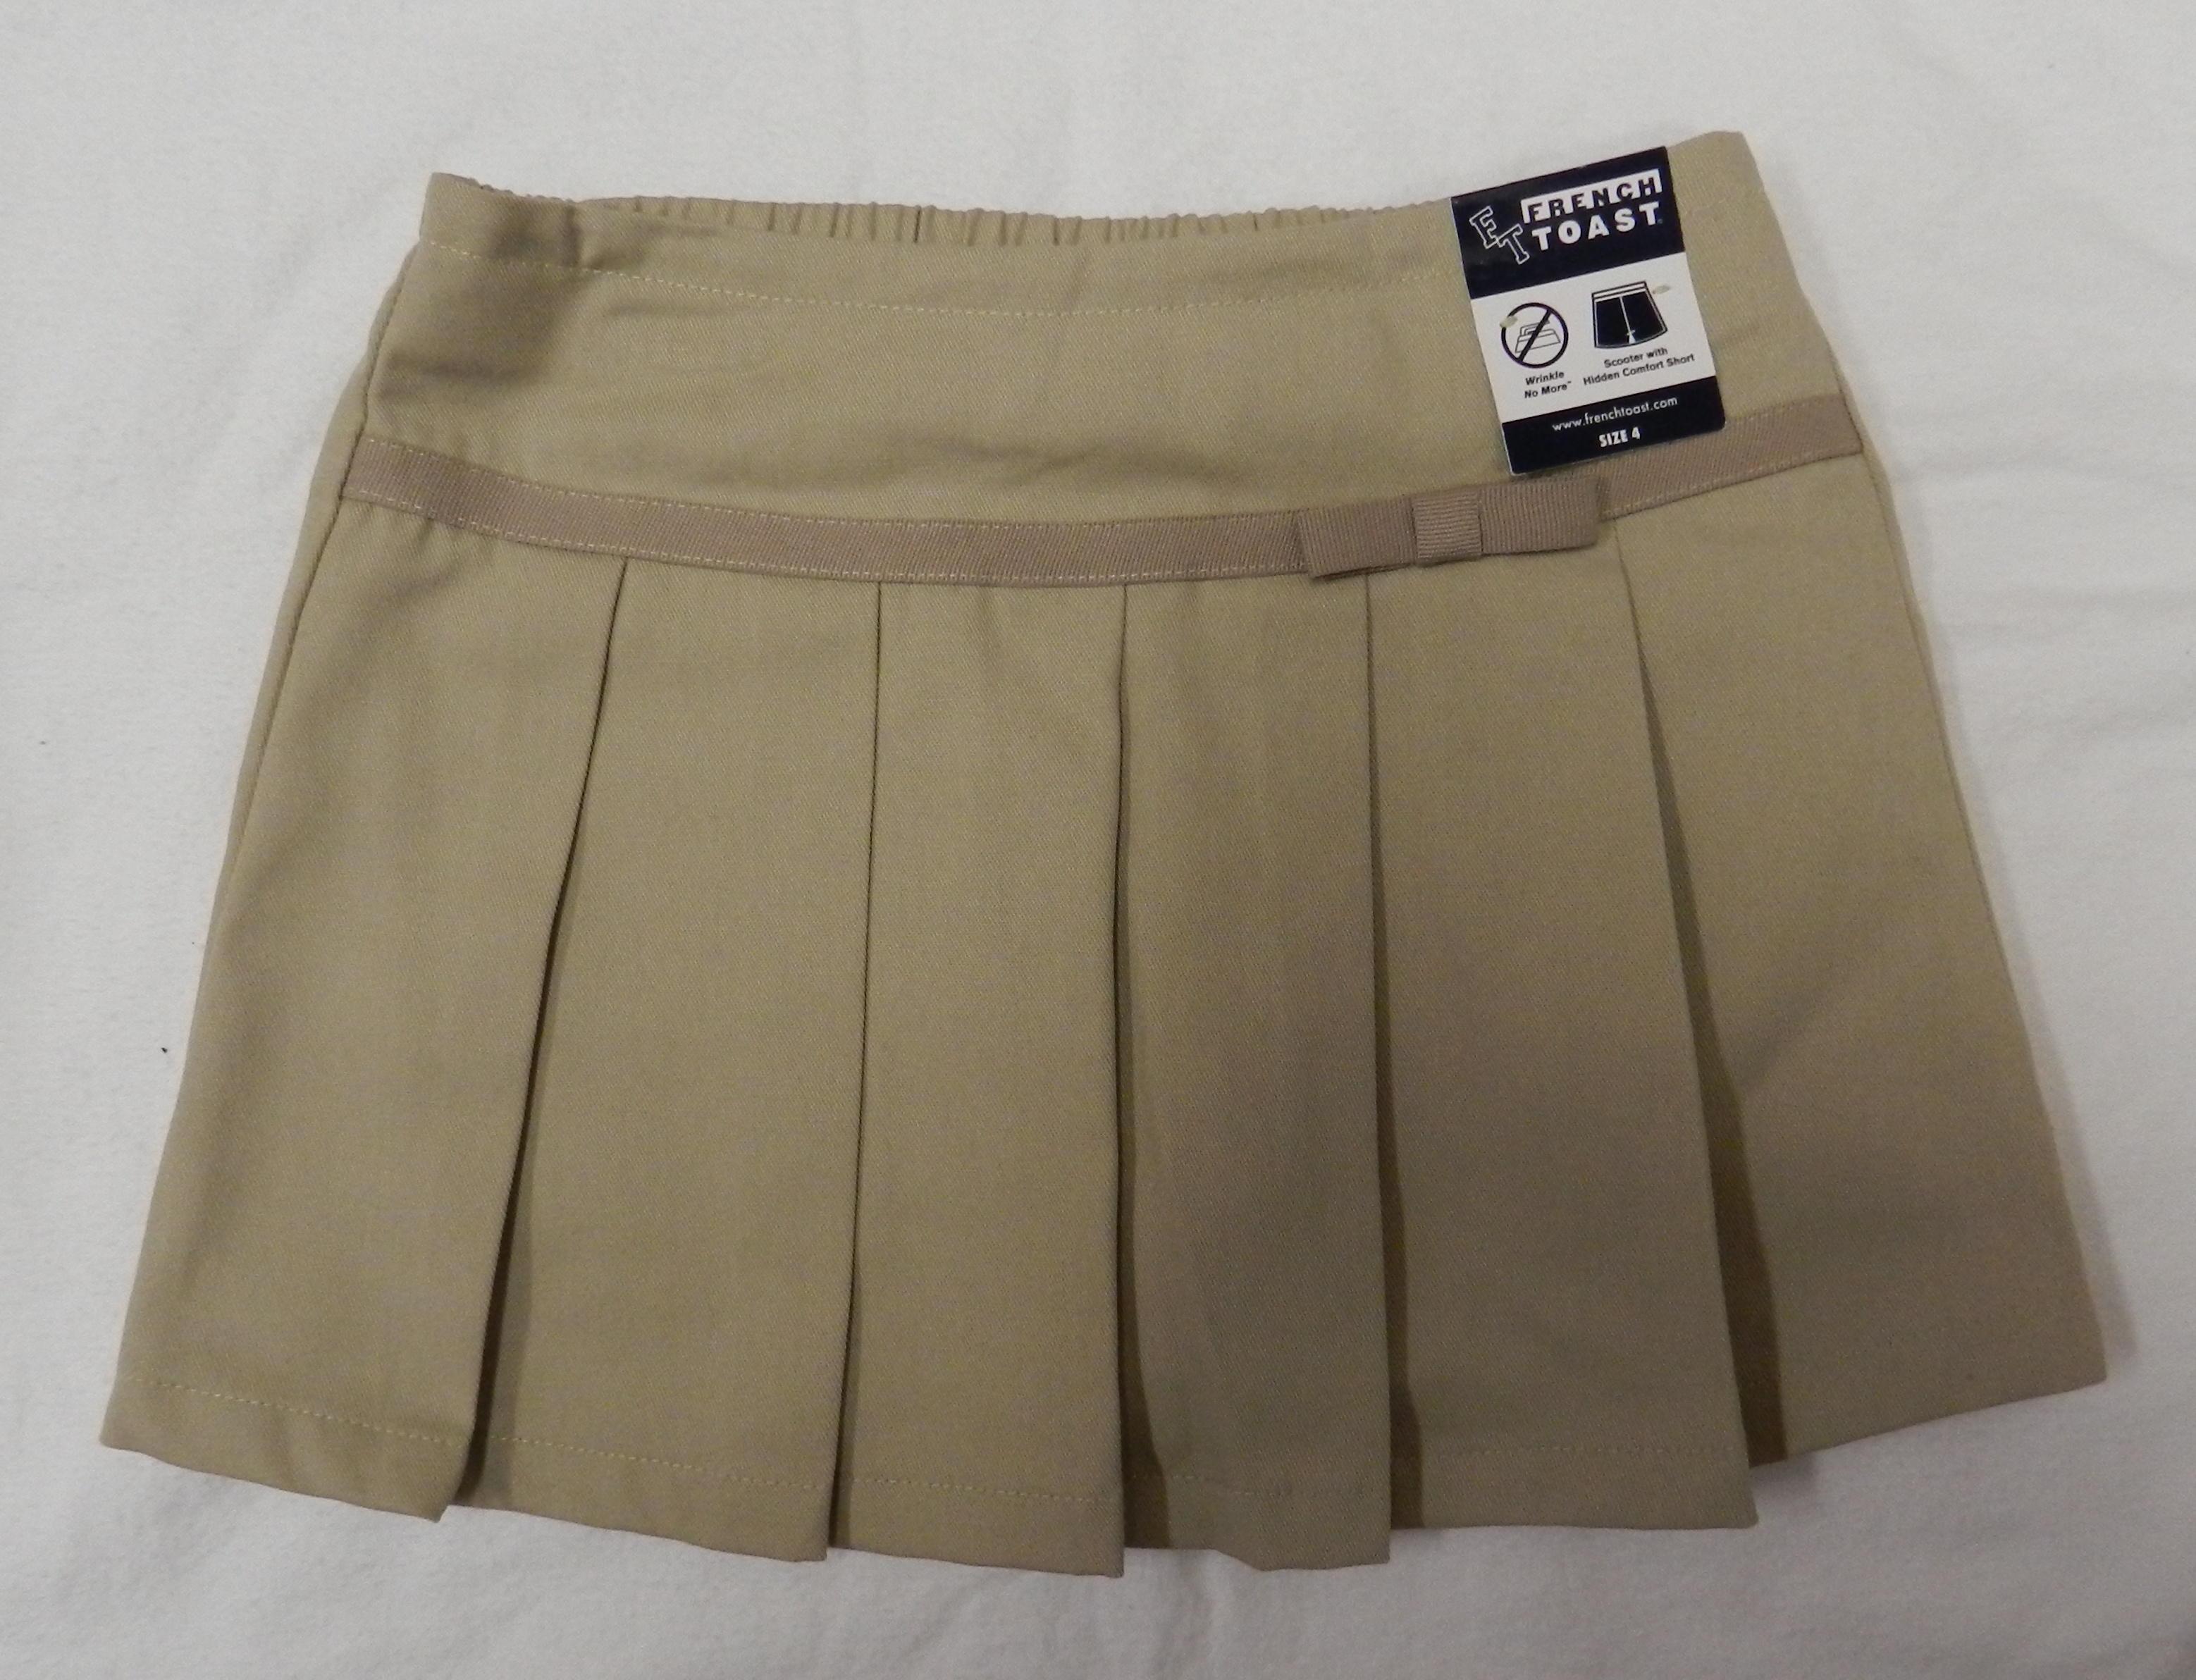 Khaki Uniform Skirts 103